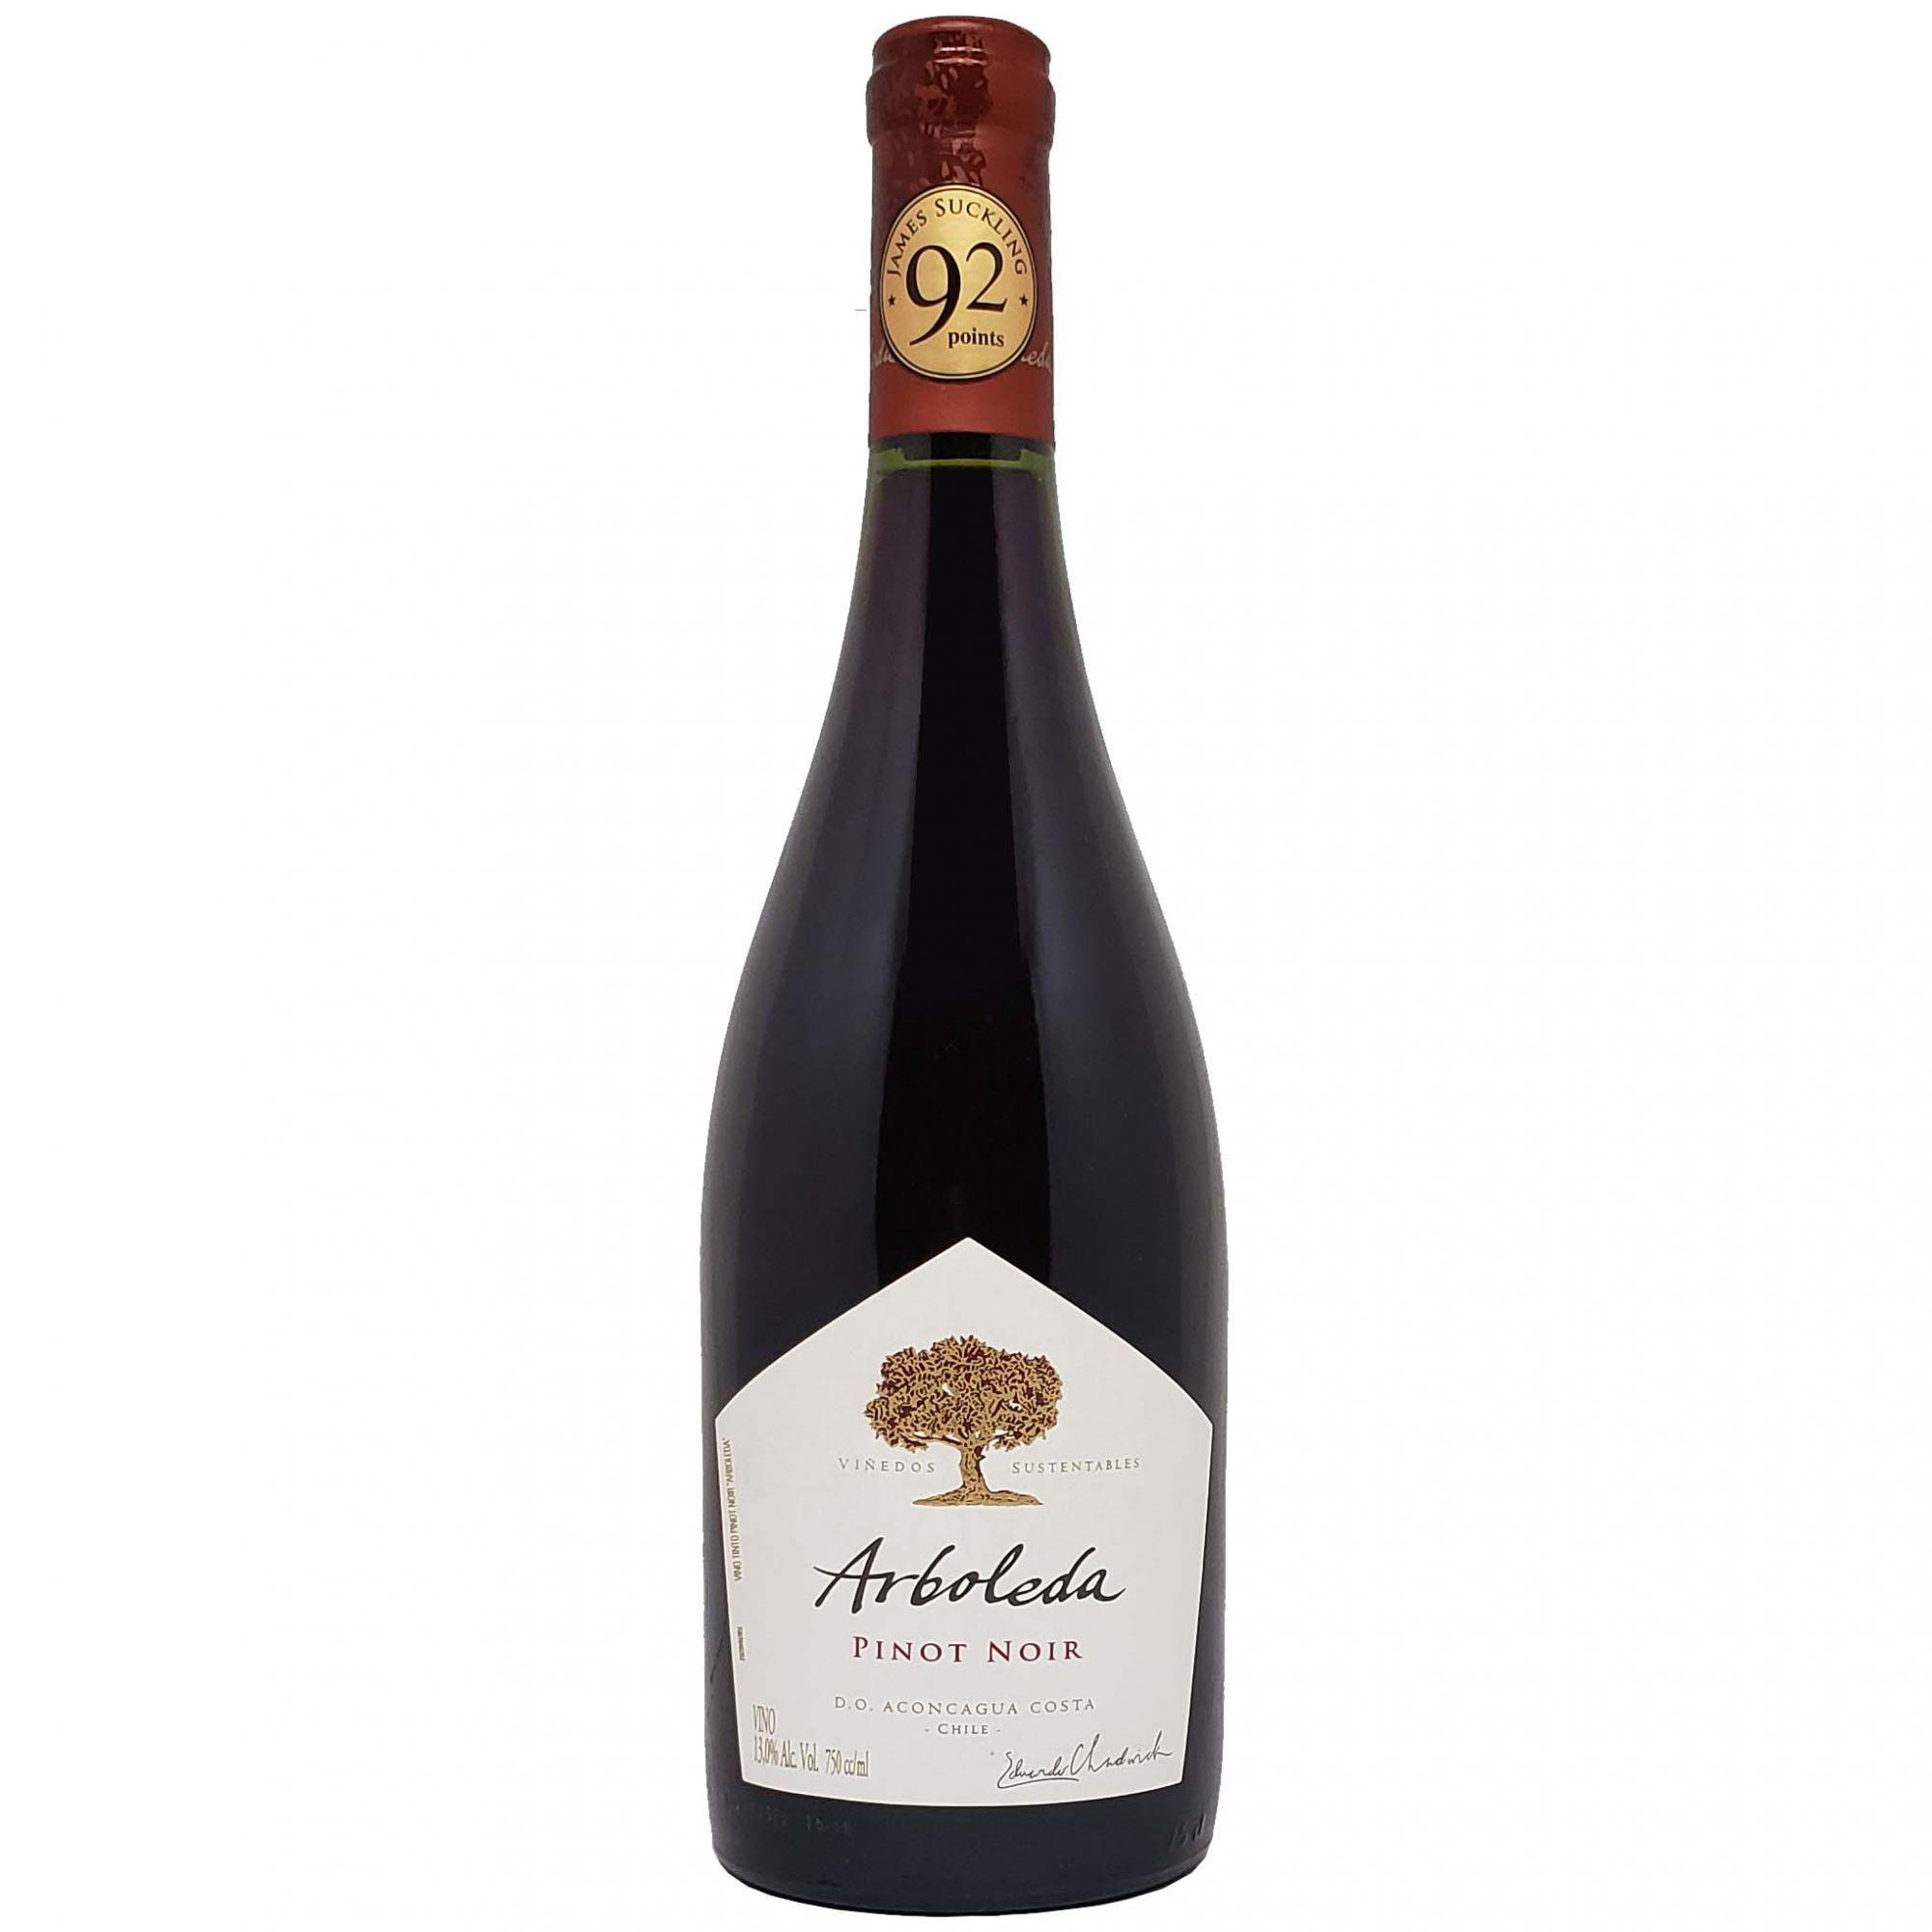 Vinho Tinto Arboleda Pinot Noir - 750ml -